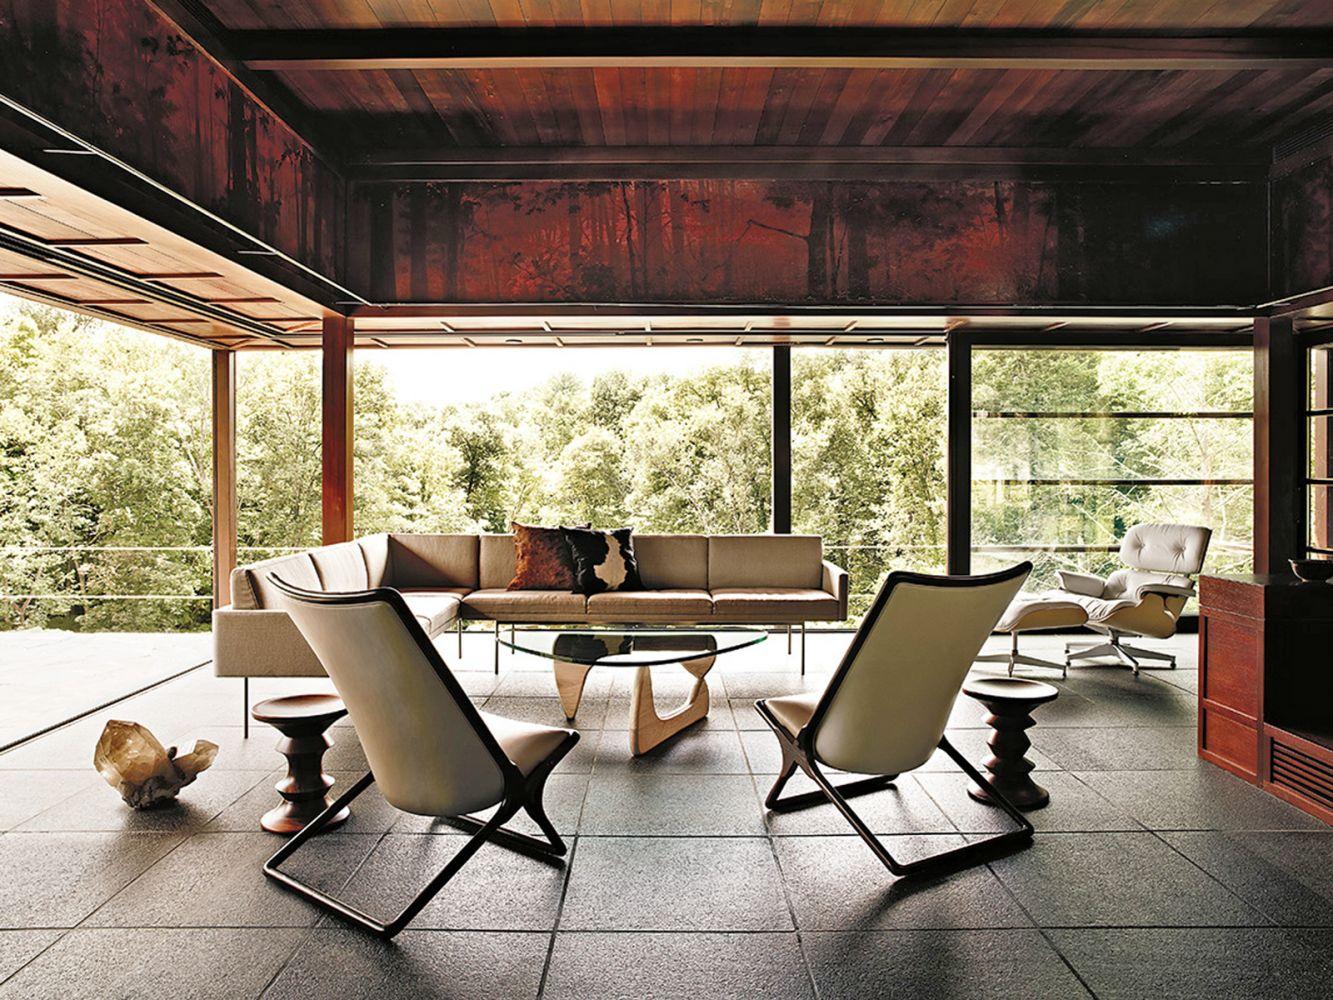 herman miller mobilier design am ricain meuble et d coration marseille mobilier design. Black Bedroom Furniture Sets. Home Design Ideas